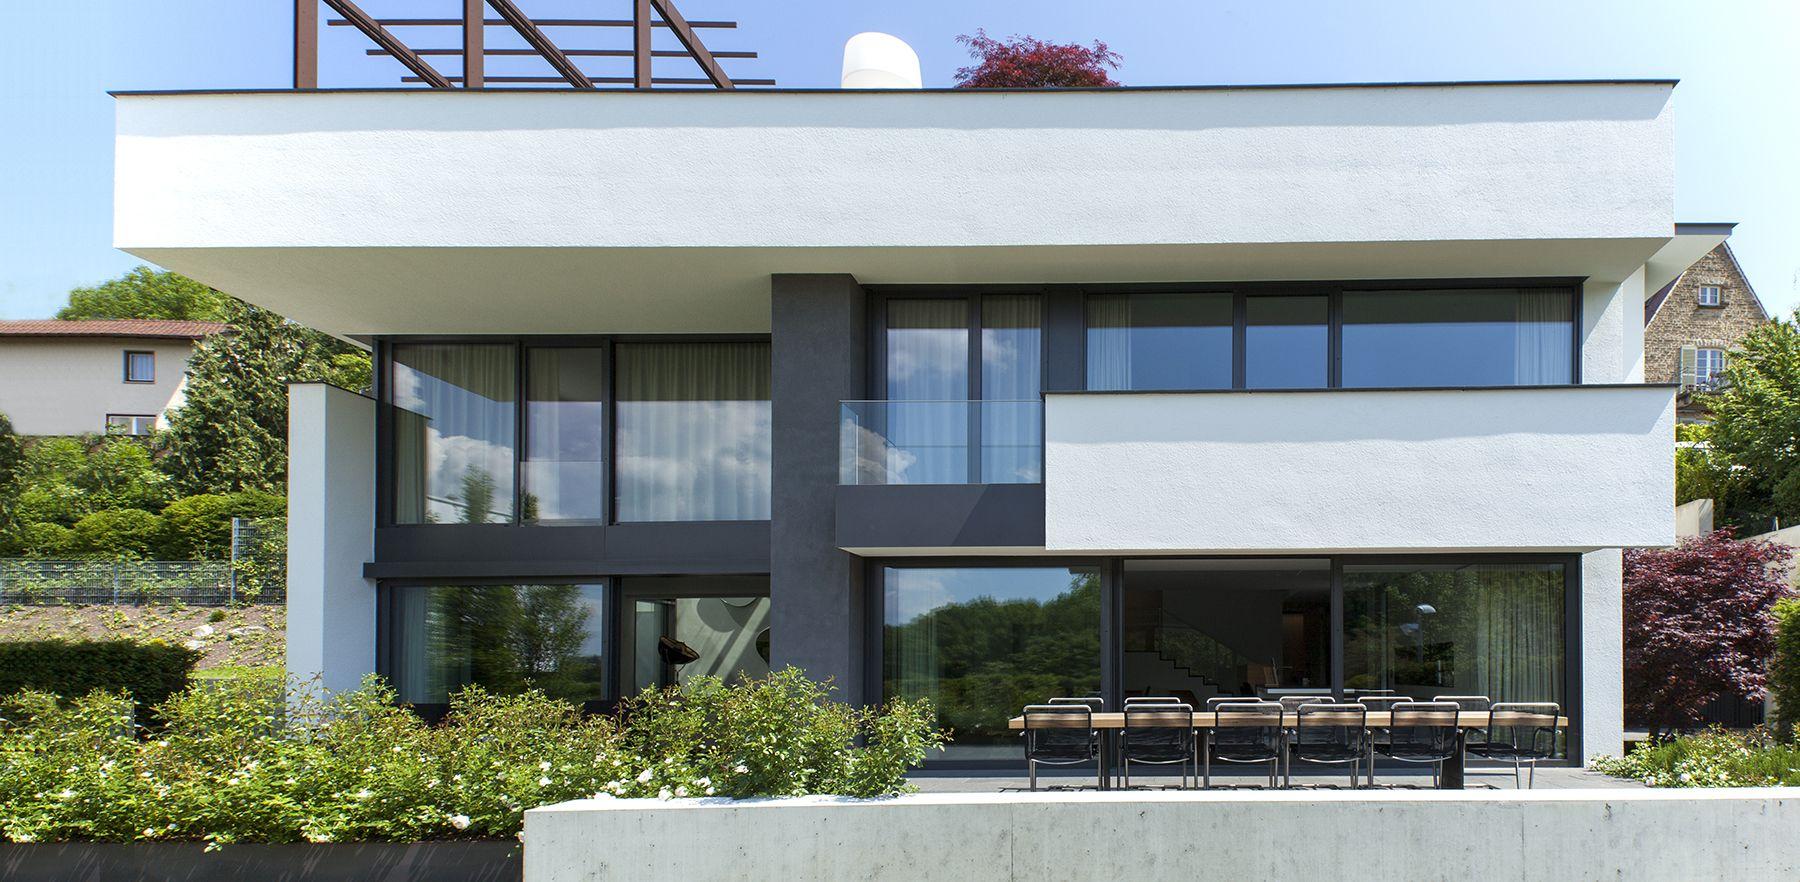 Projekt   Haus GJ Stuttgart | Architekten Bda: Fuchs, Wacker.